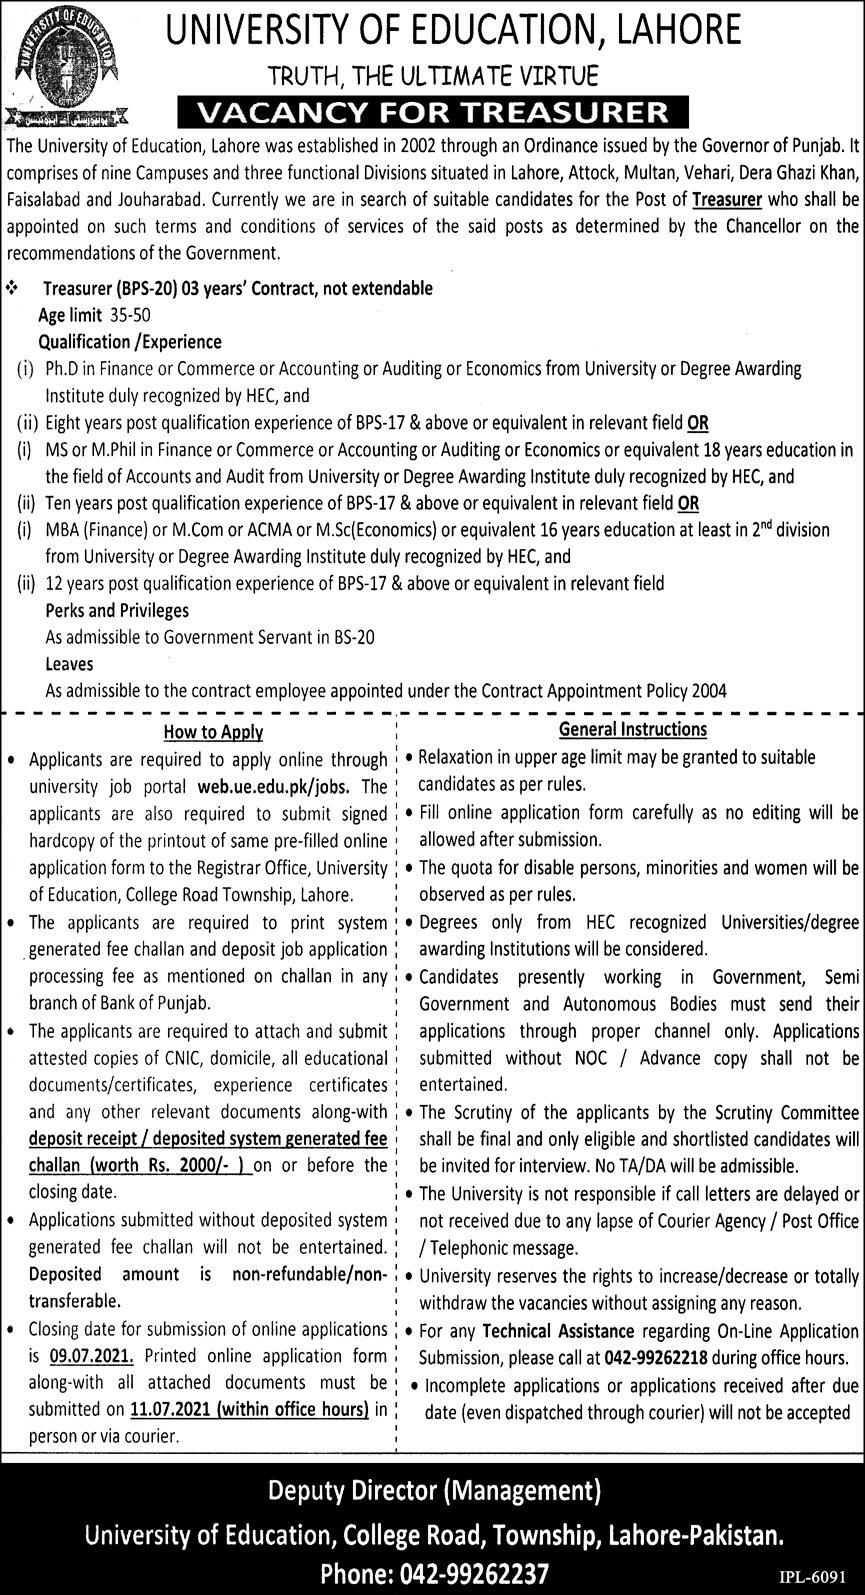 web.ue.edu.pk Jobs 2021 - UE University of Education Lahore Jobs 2021 in Pakistan